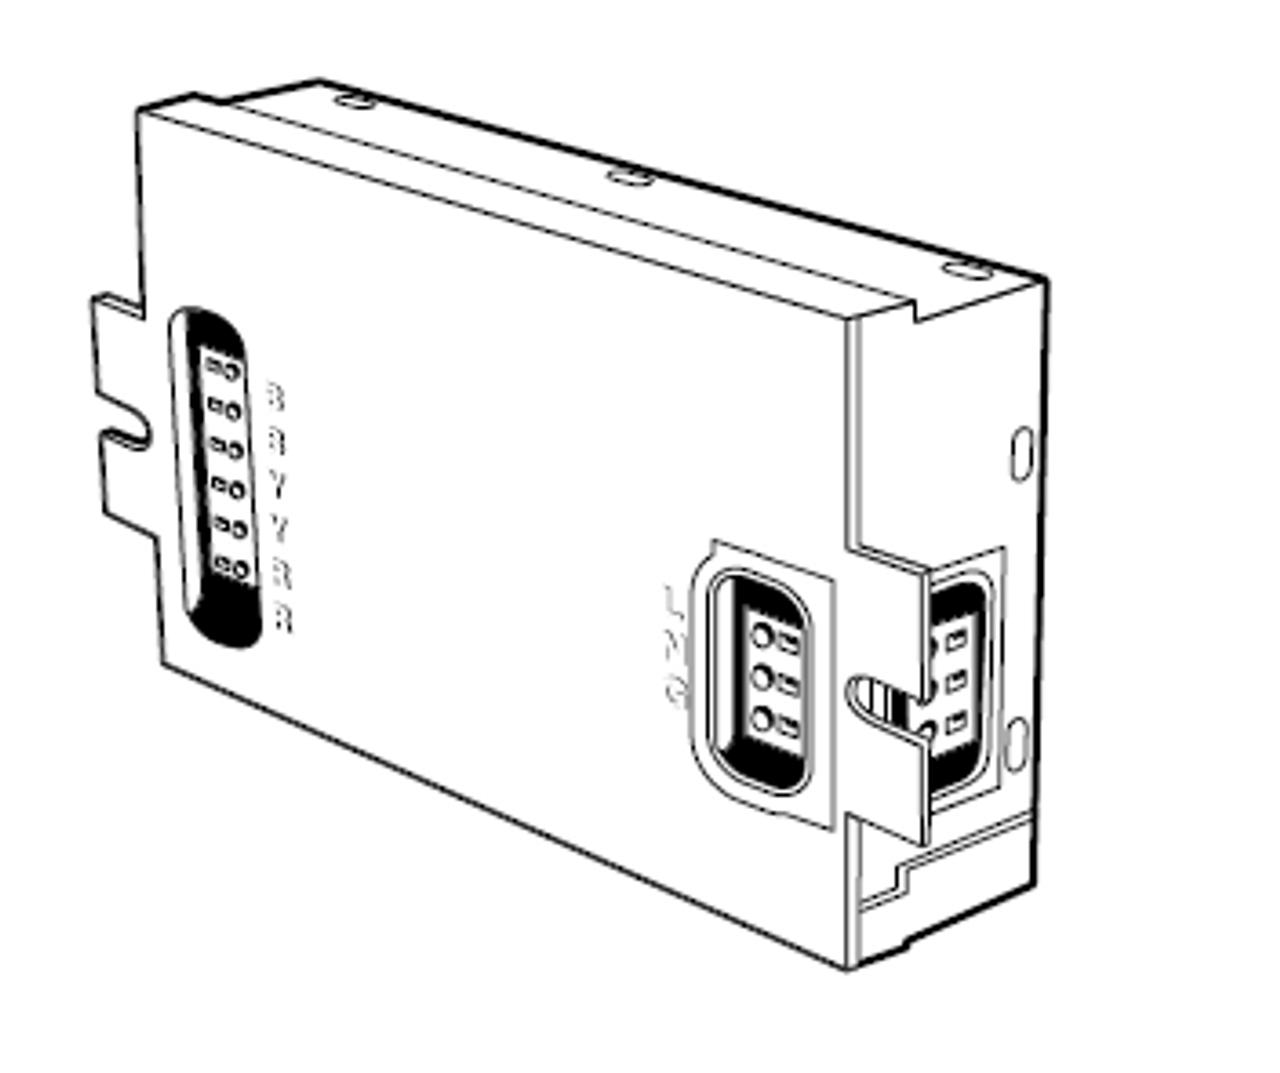 2-Lamp 120//277V Universal C242UNVBE Electronic Fluorescent Ballast CFL CFM42W//GX24q 42W